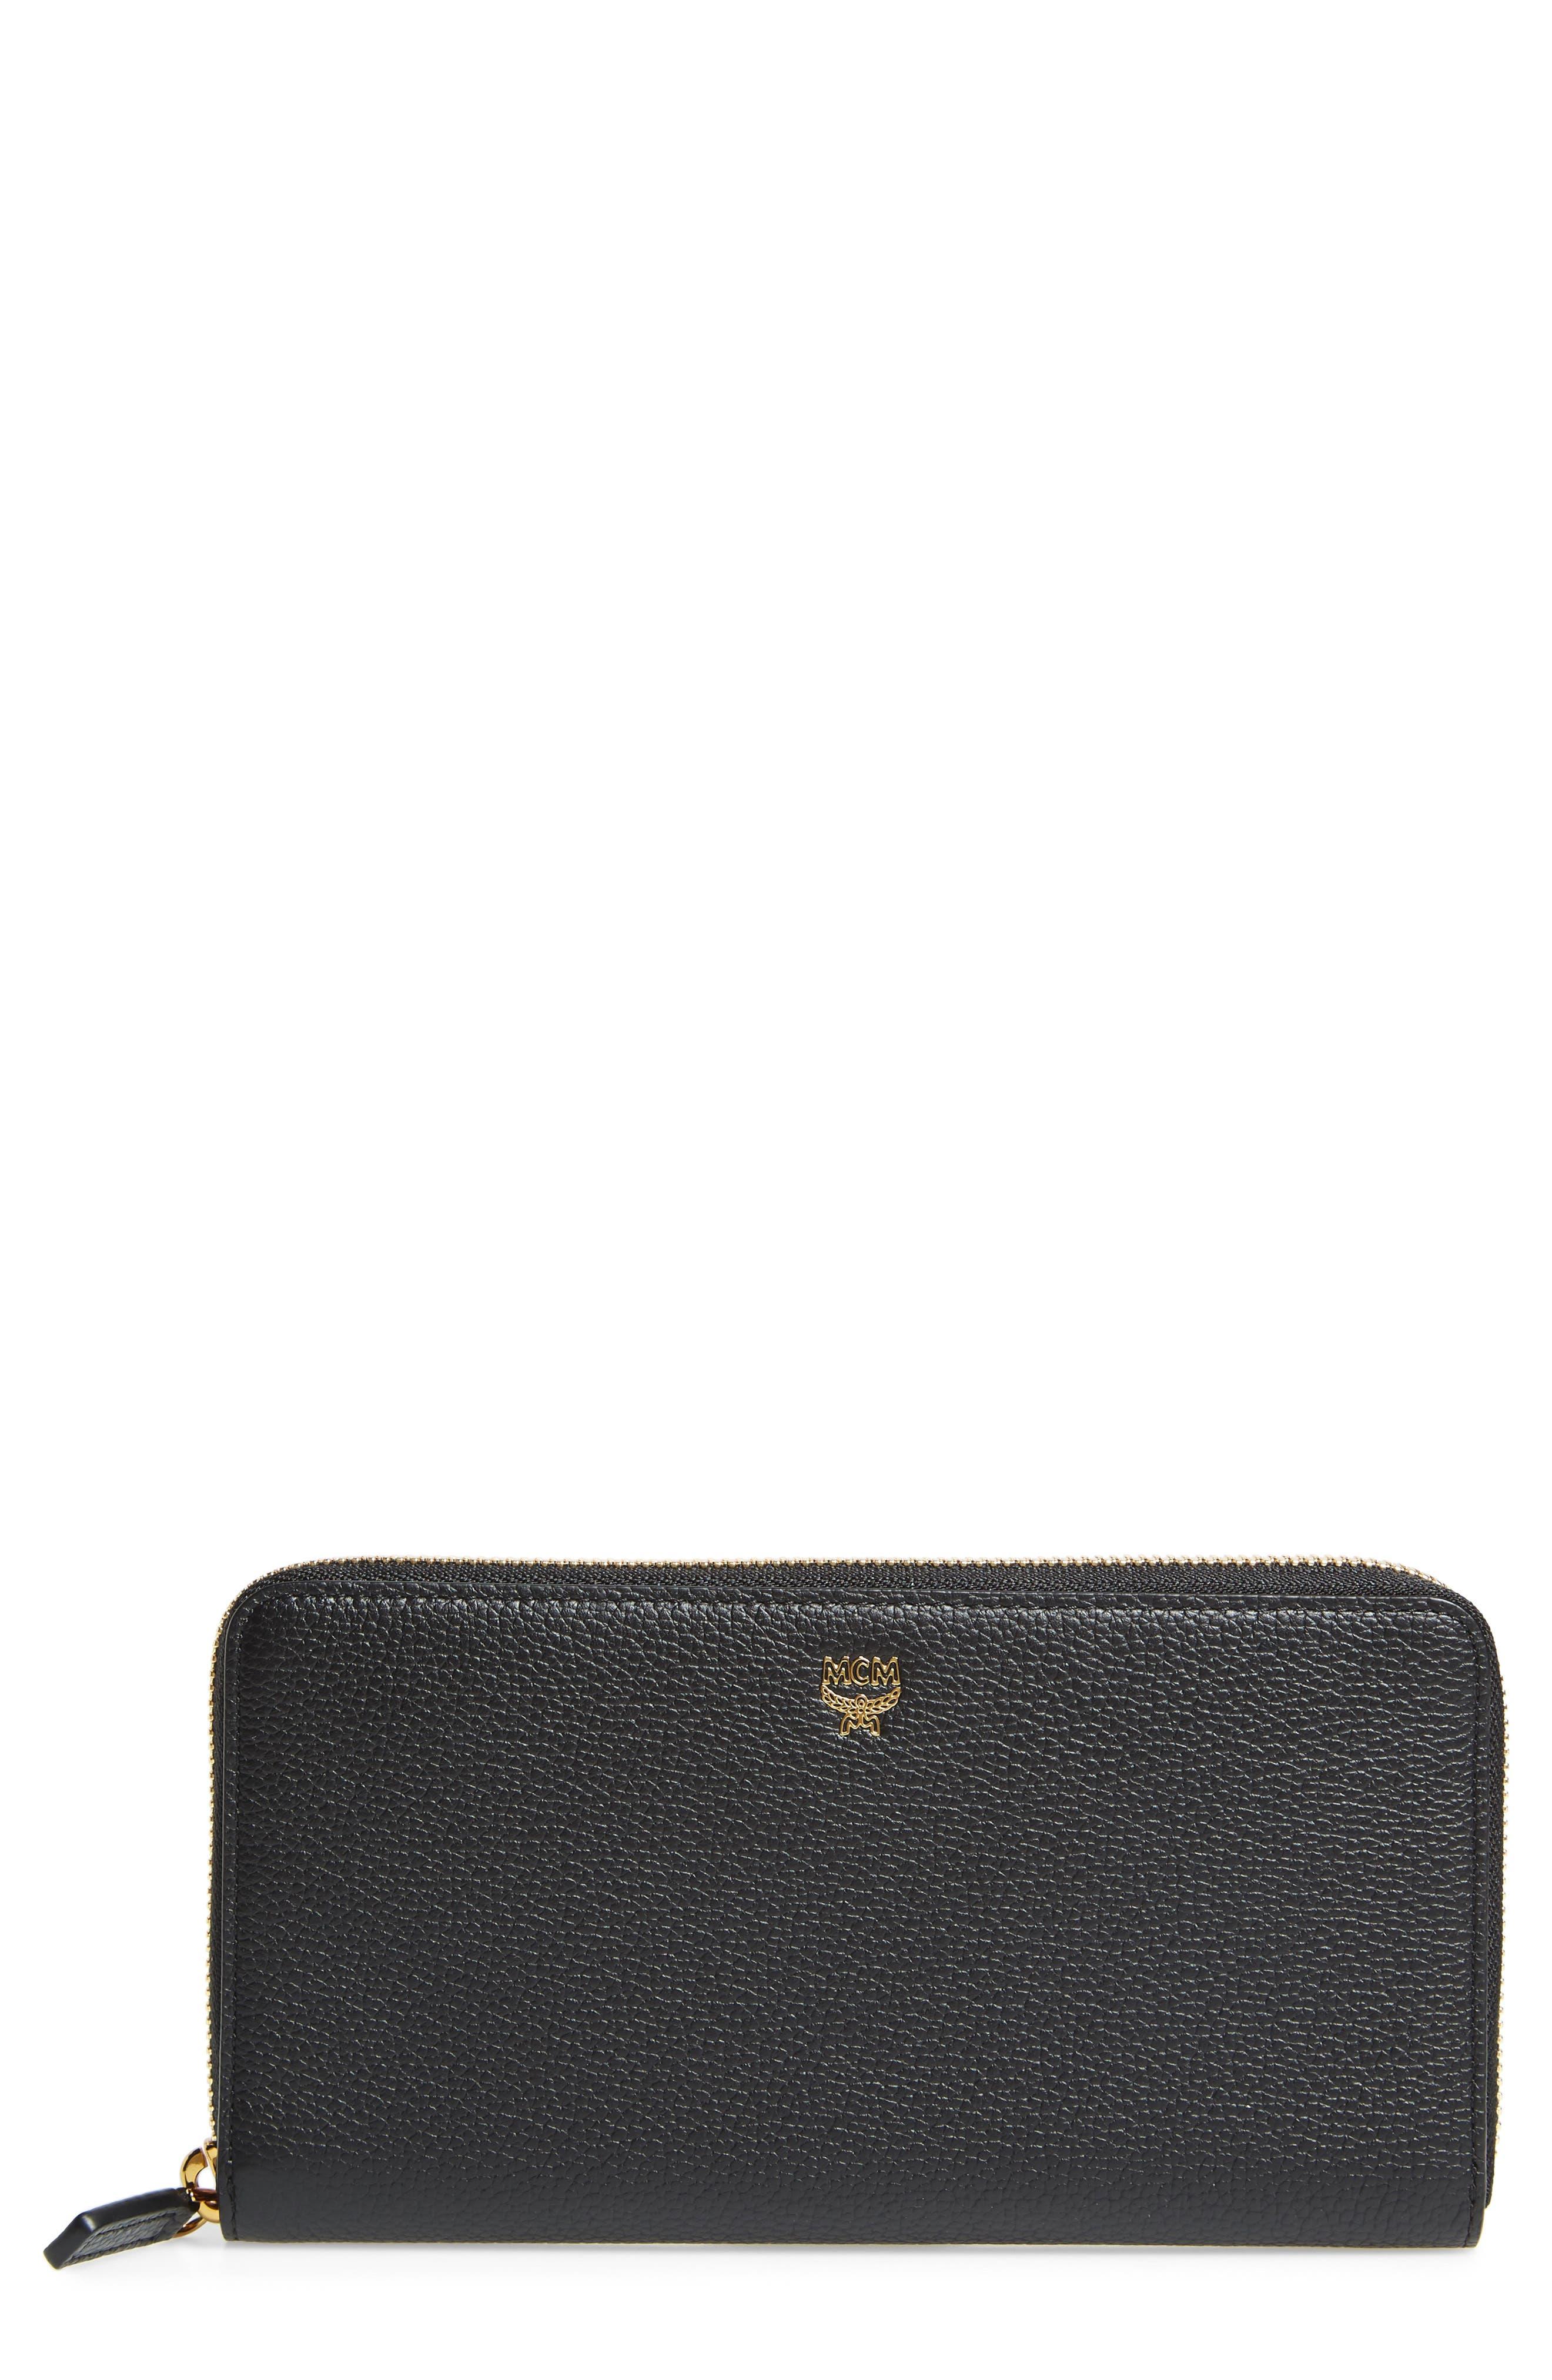 Main Image - MCM Large Milla Zip-Around Leather Wallet